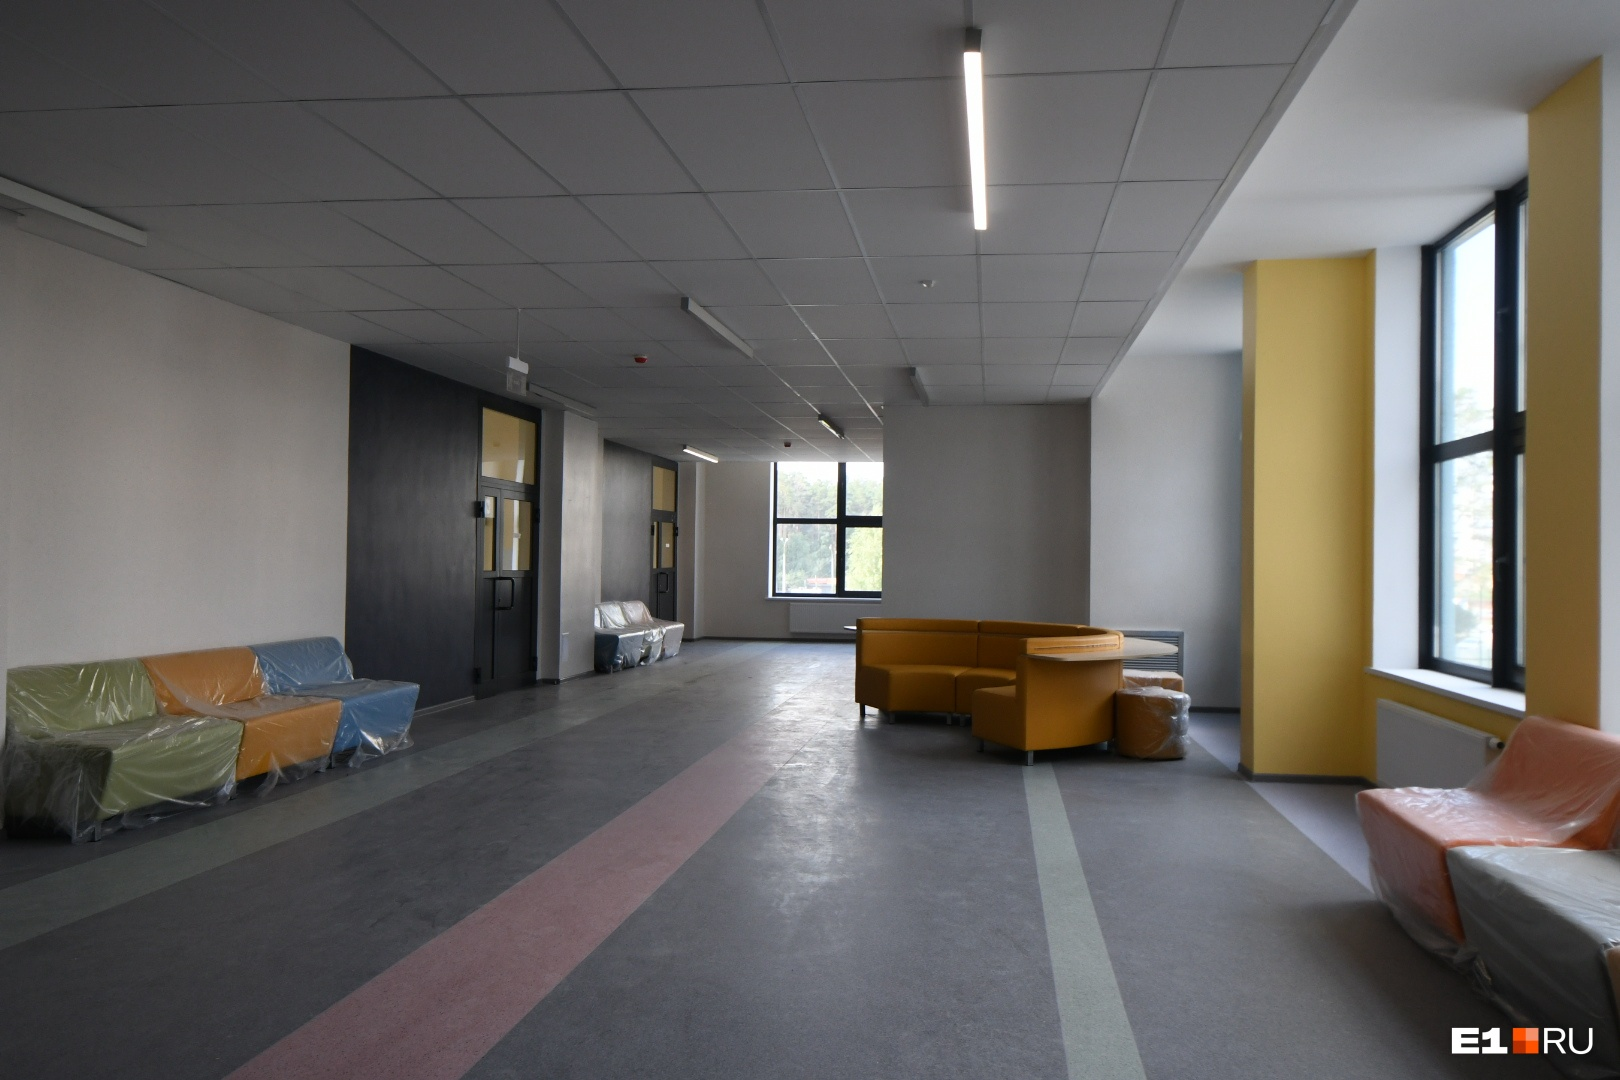 Коридор новой школы